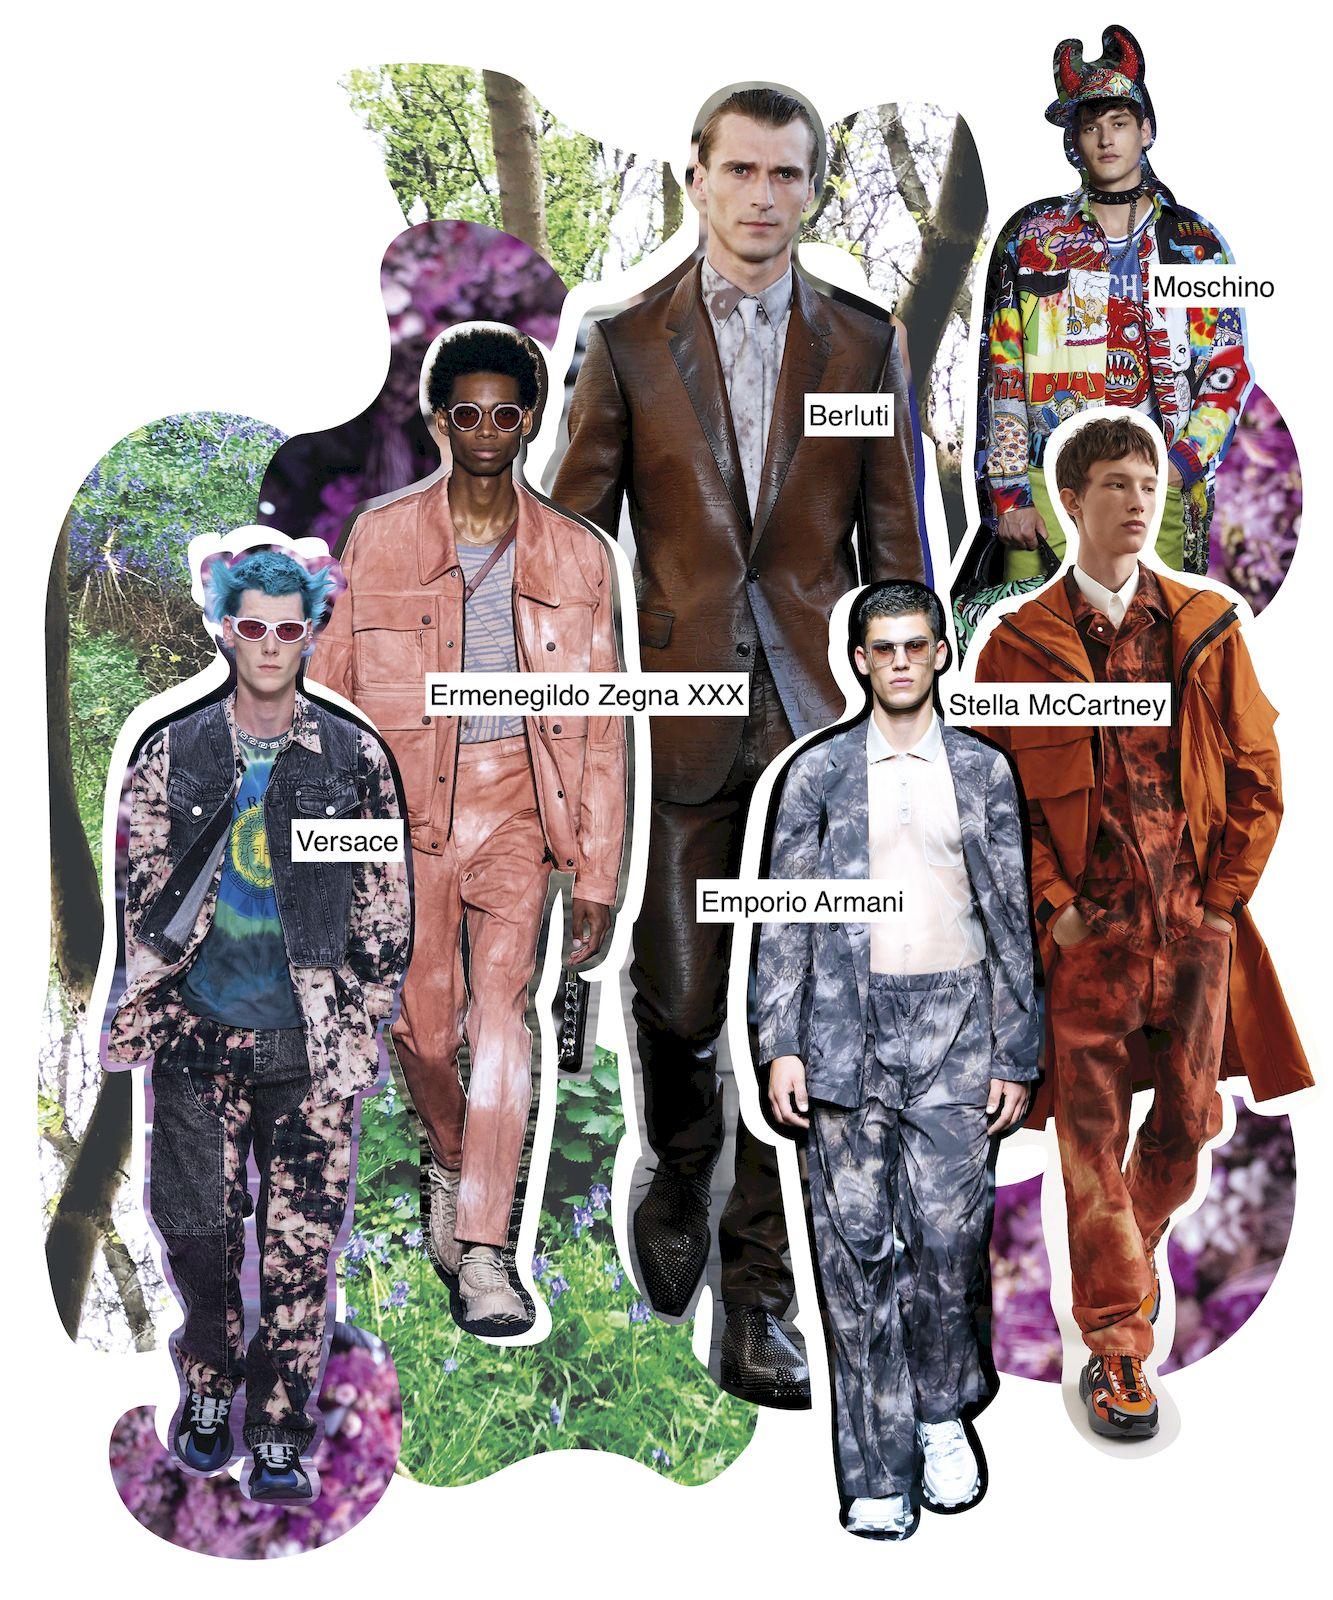 p0220-fashion-ss2020-mens-trend-report-5-tie-dye-must-try.jpg